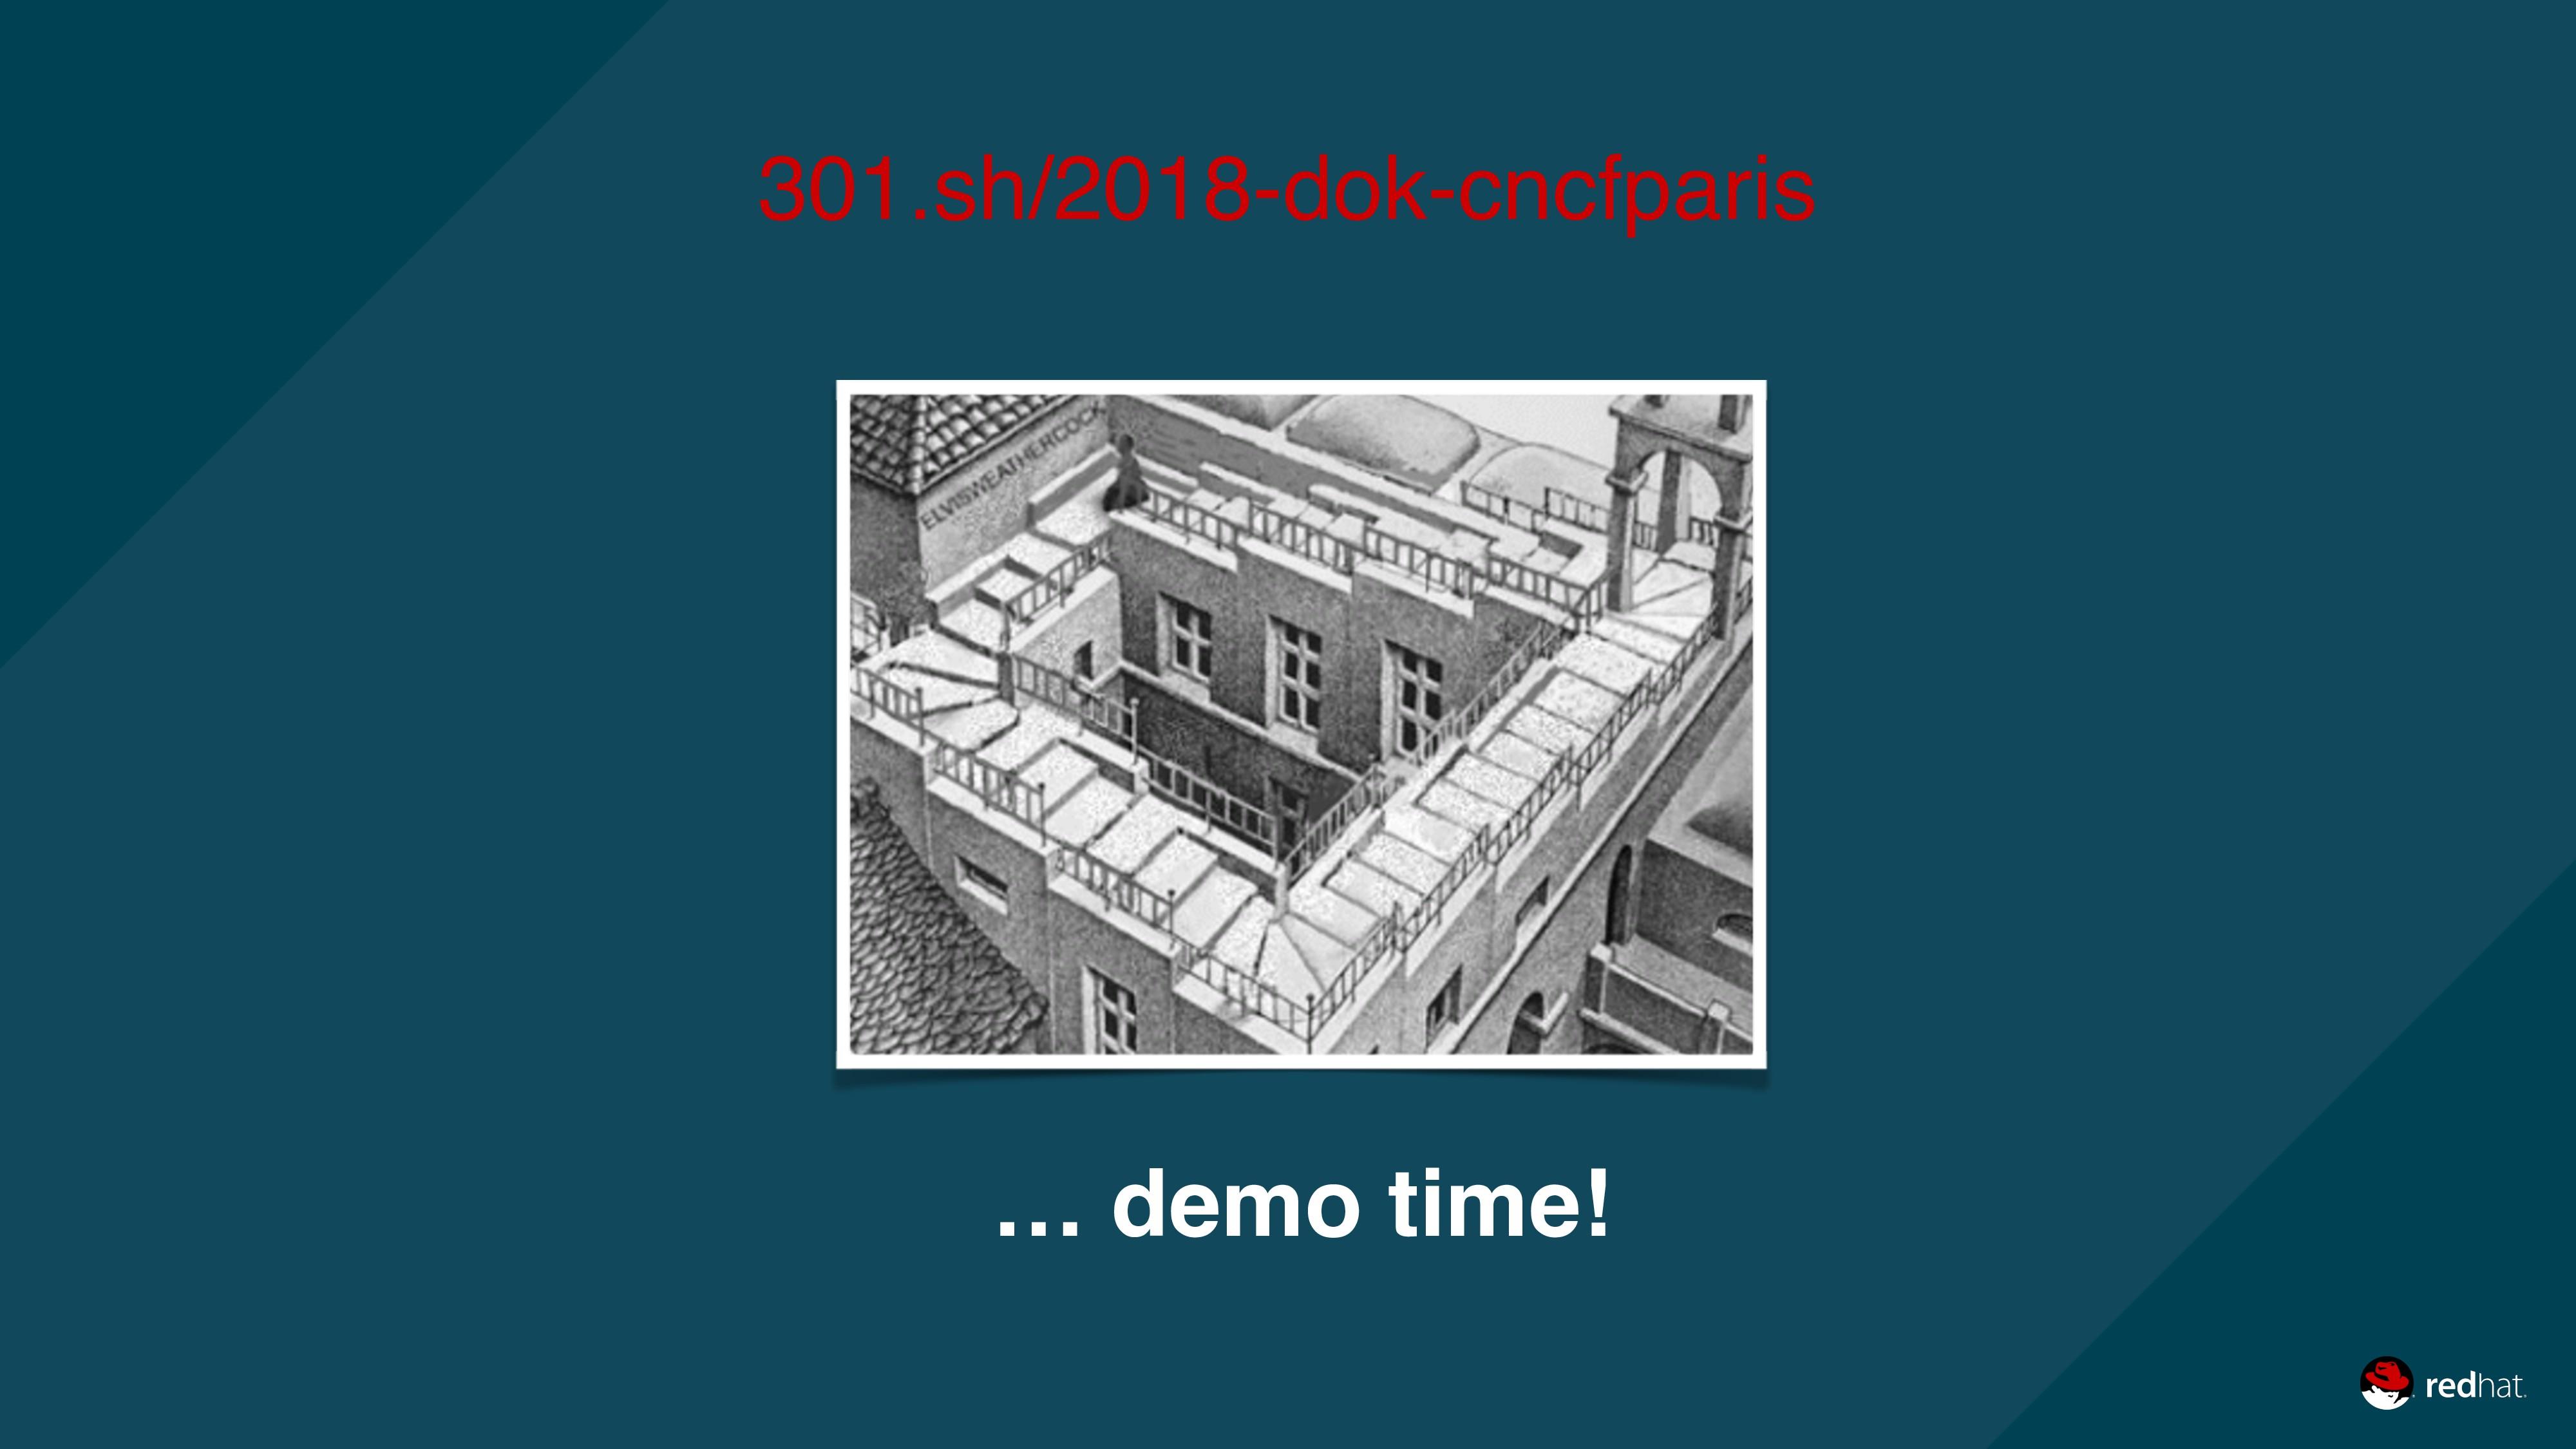 … demo time! 301.sh/2018-dok-cncfparis